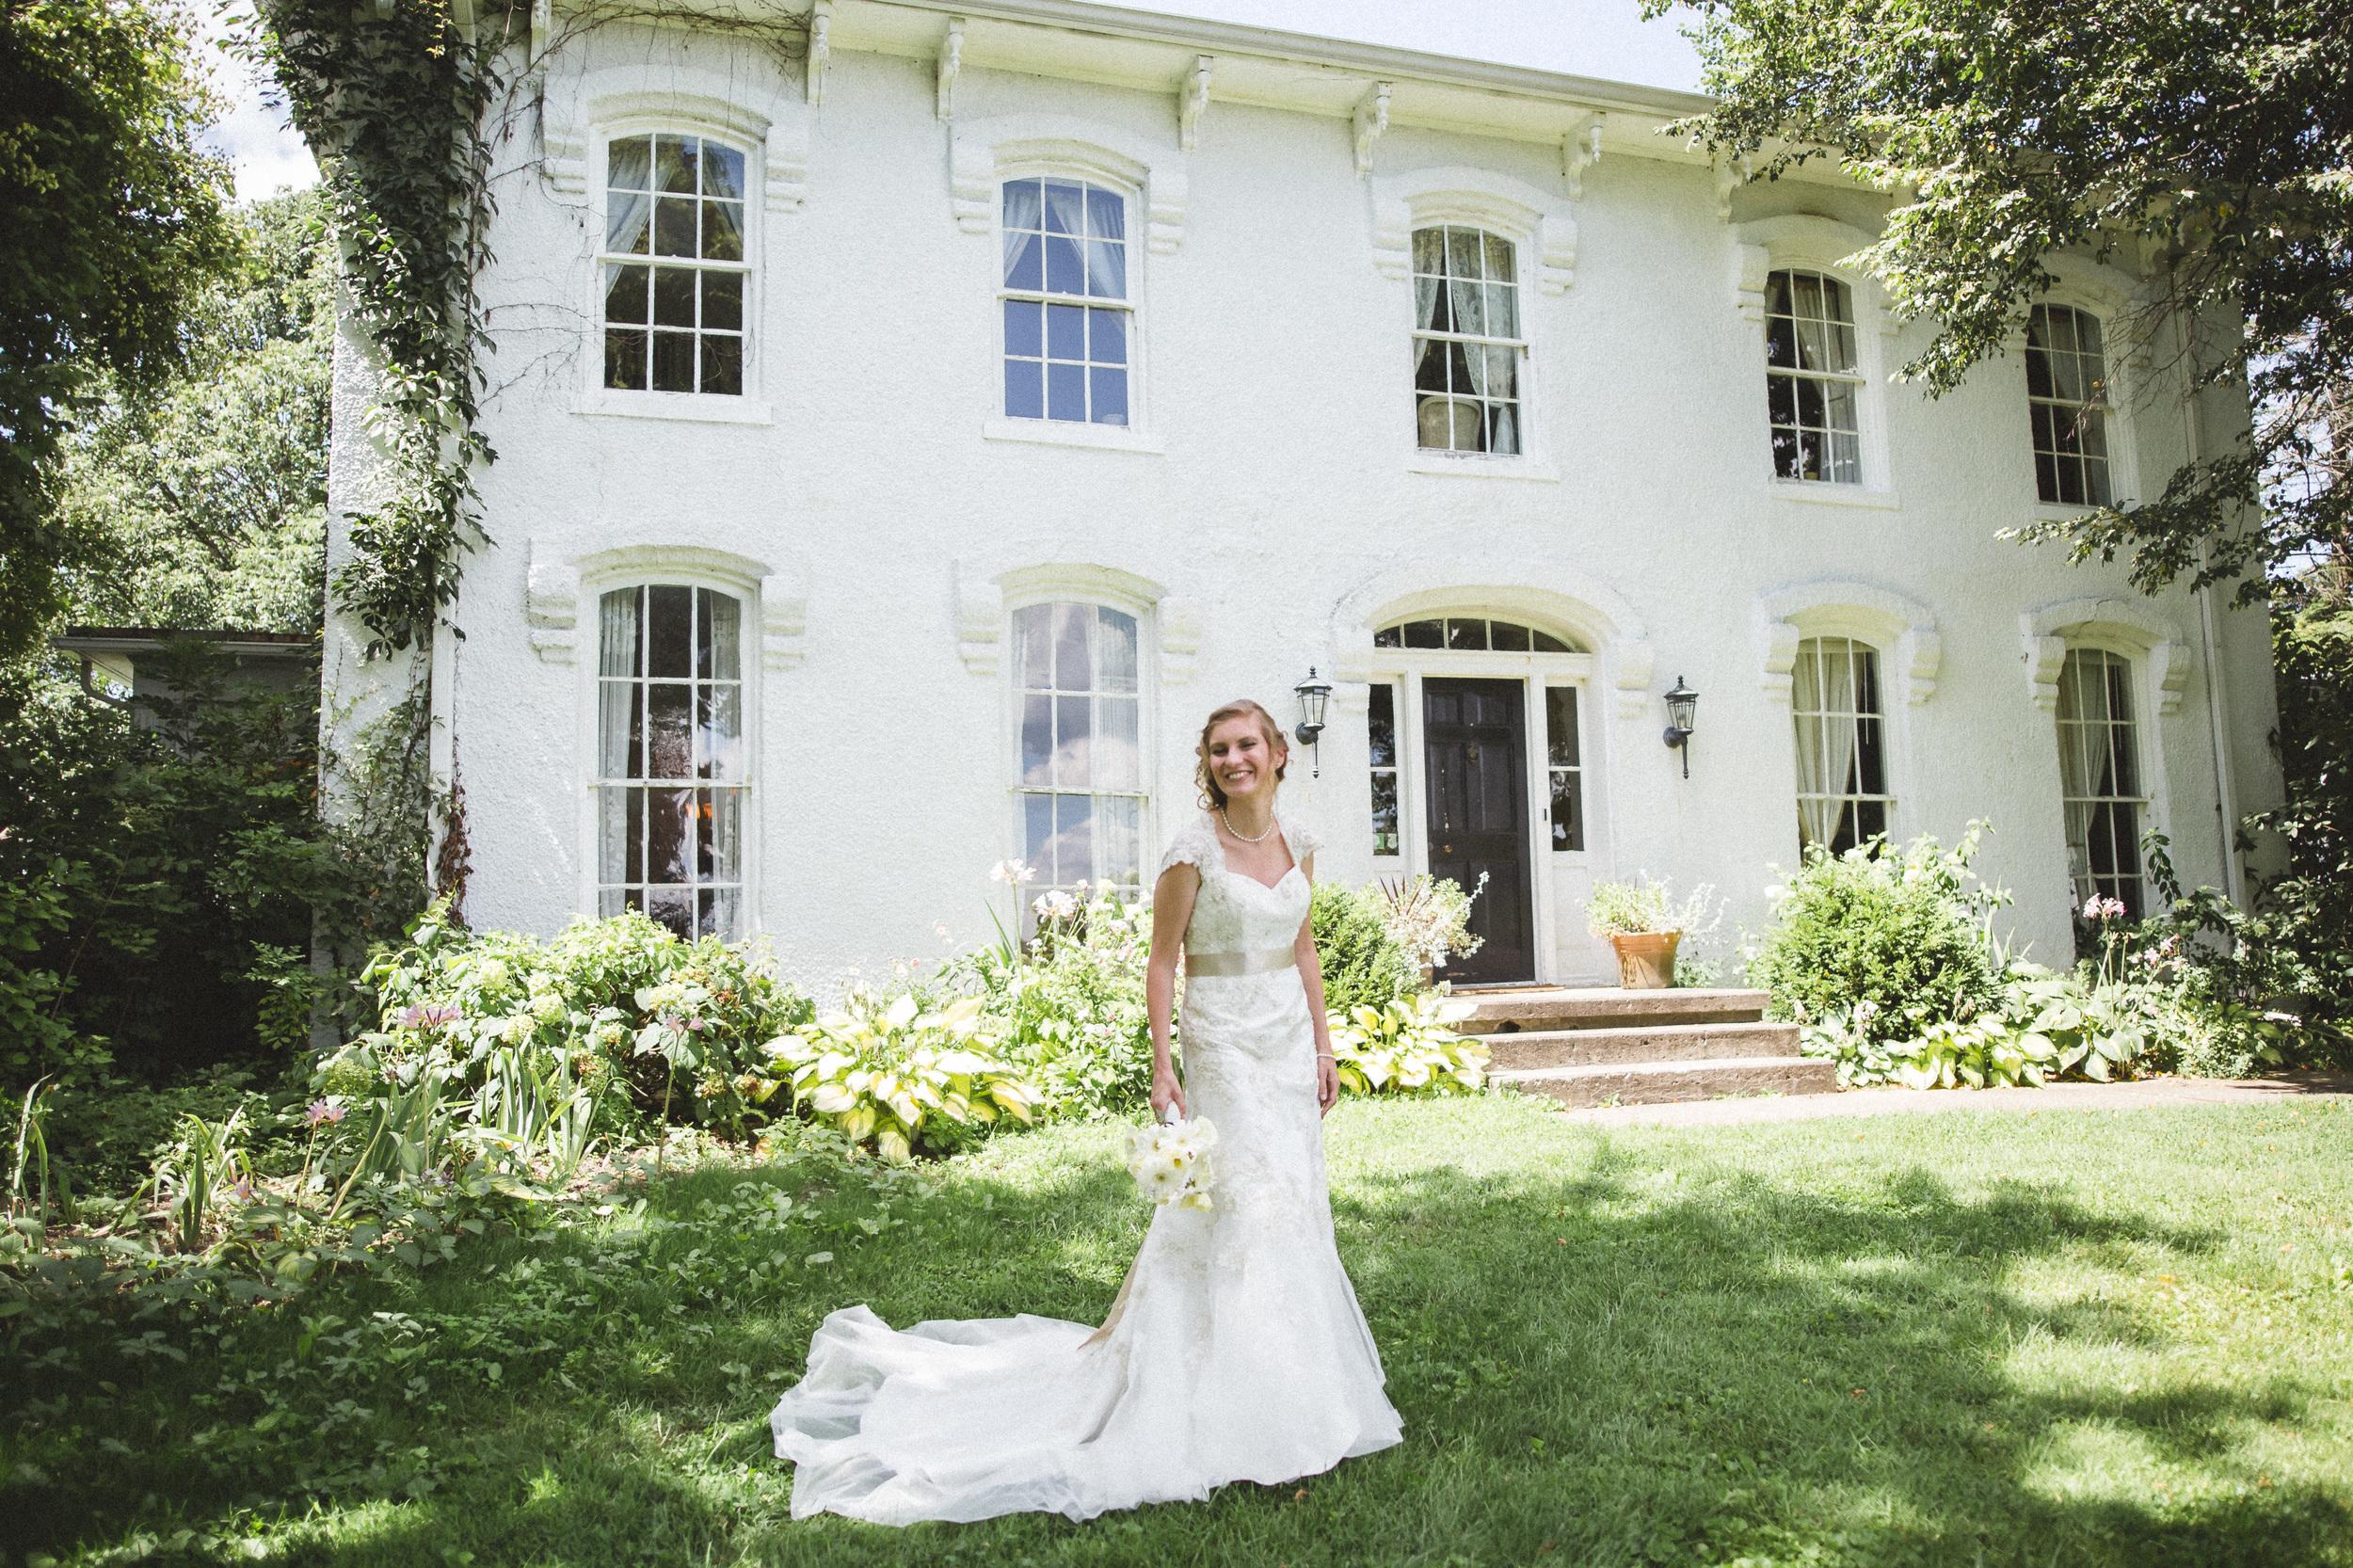 Columbus Wedding Photography - 2015 Best Of - DiBlasio Photo--11.jpg